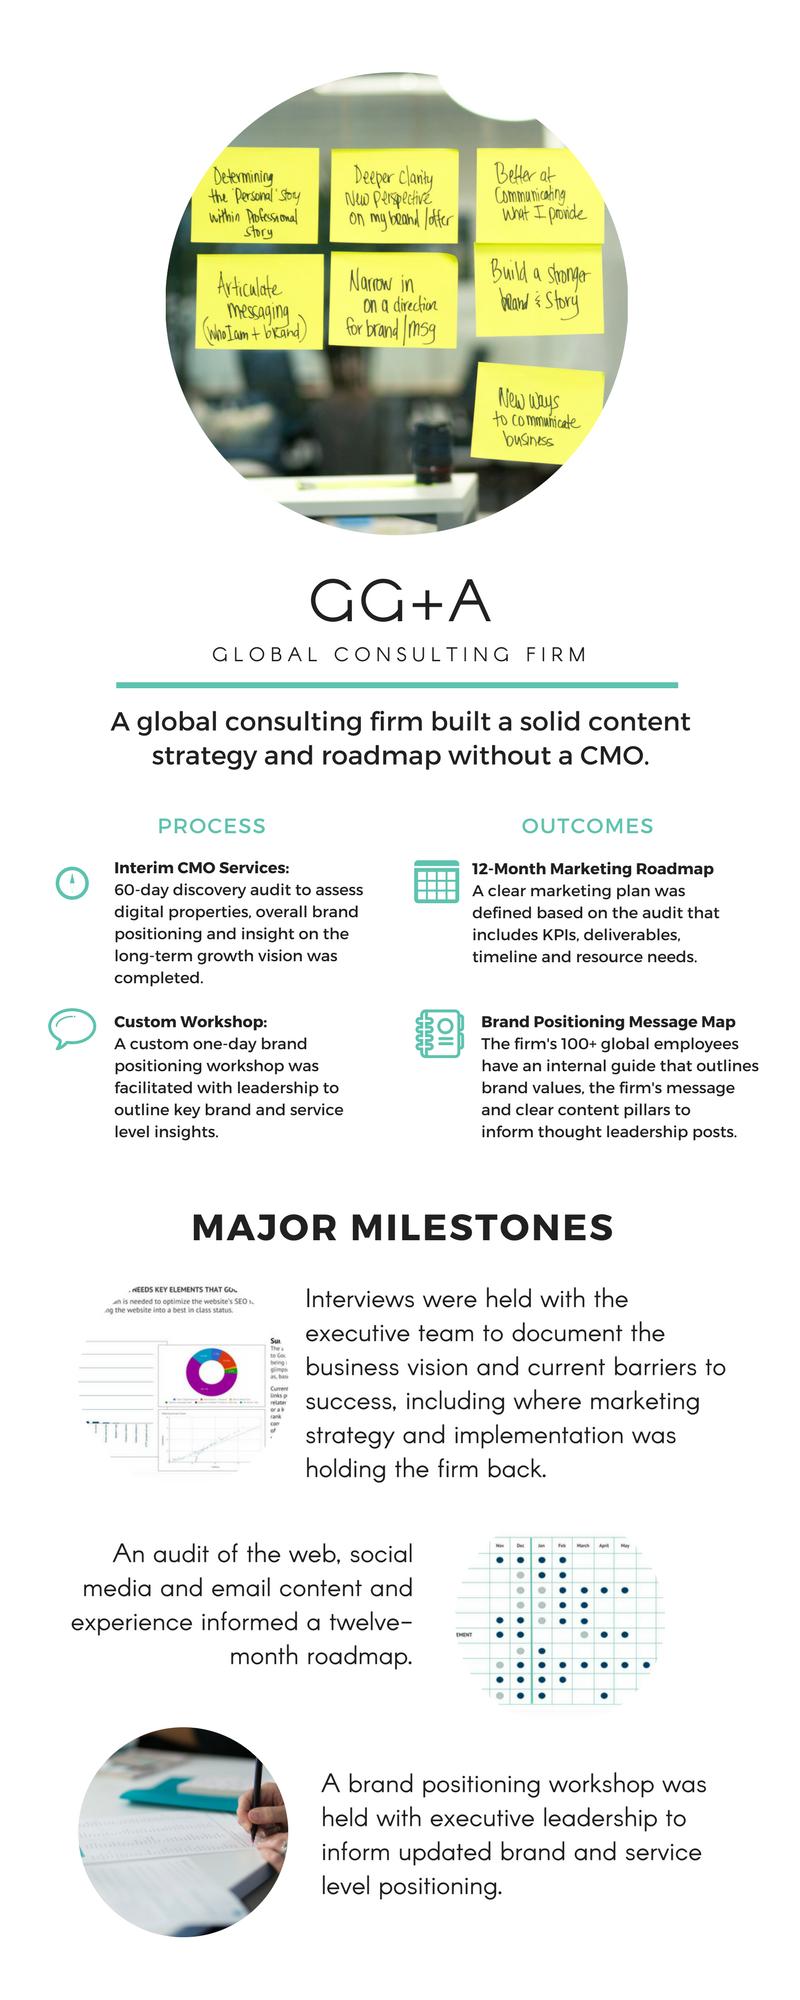 Grenzebach Glier Associates Brand Strategy